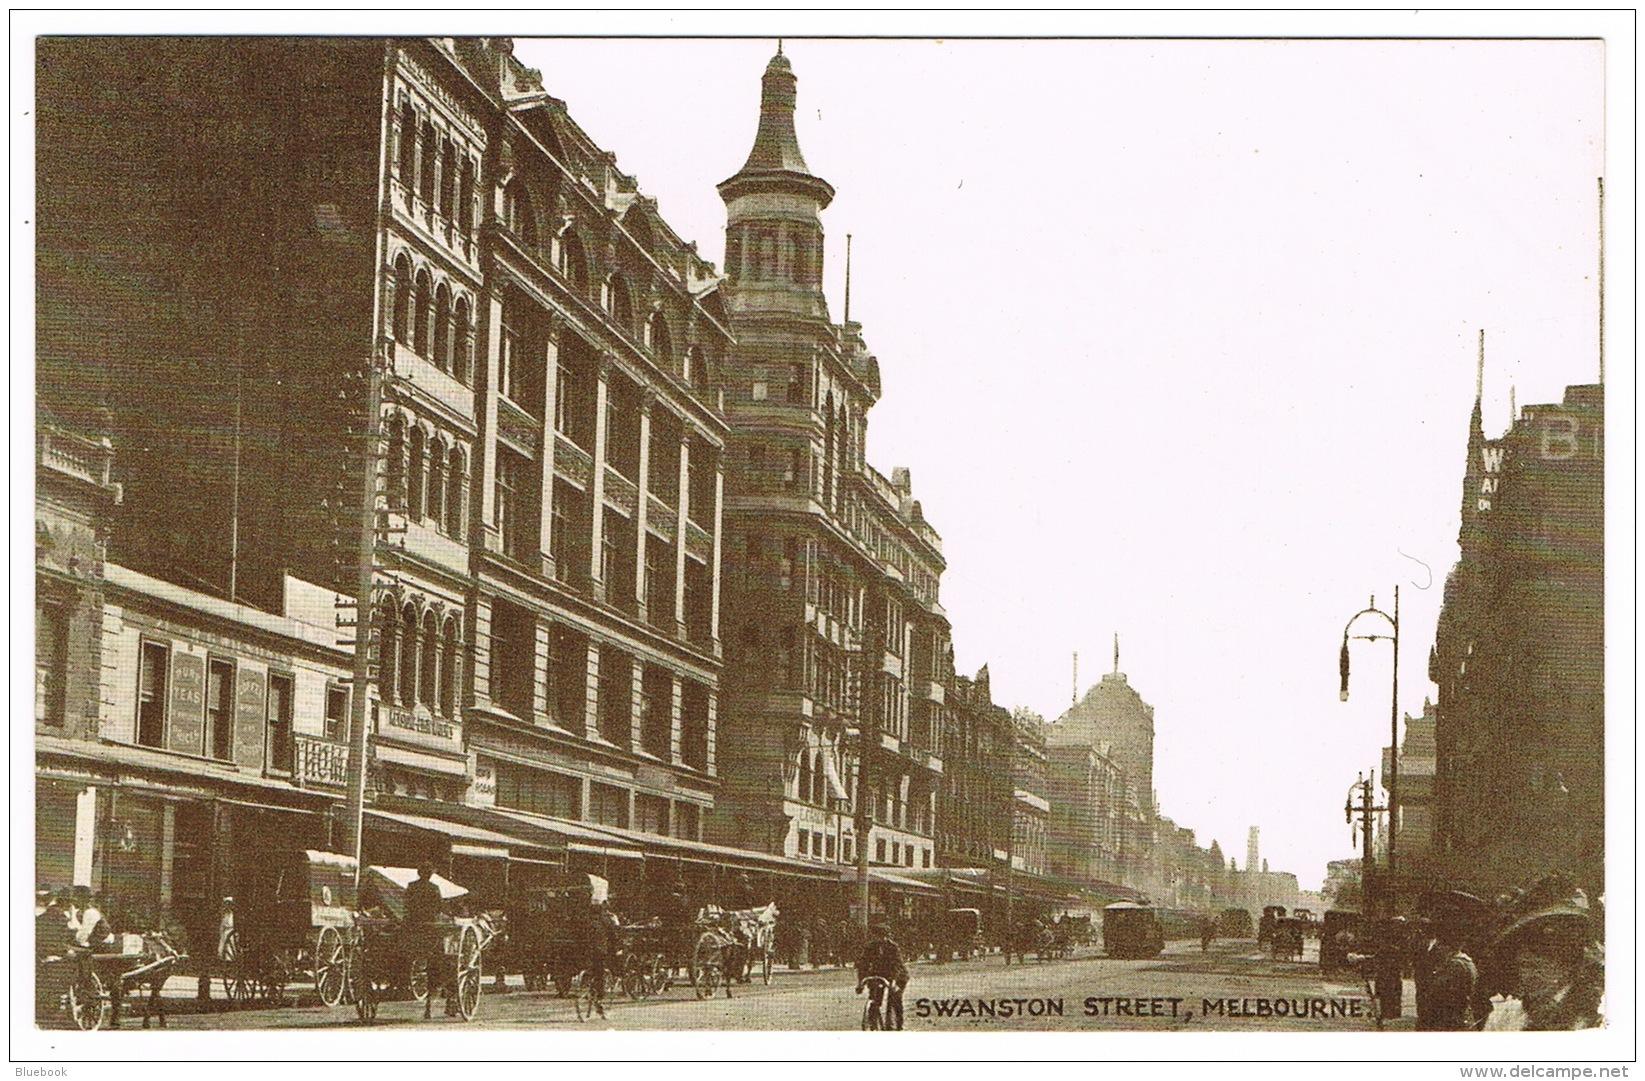 RB 1139 - Early Postcard - Swanston Street Melbourne - Victoria Australia - Melbourne